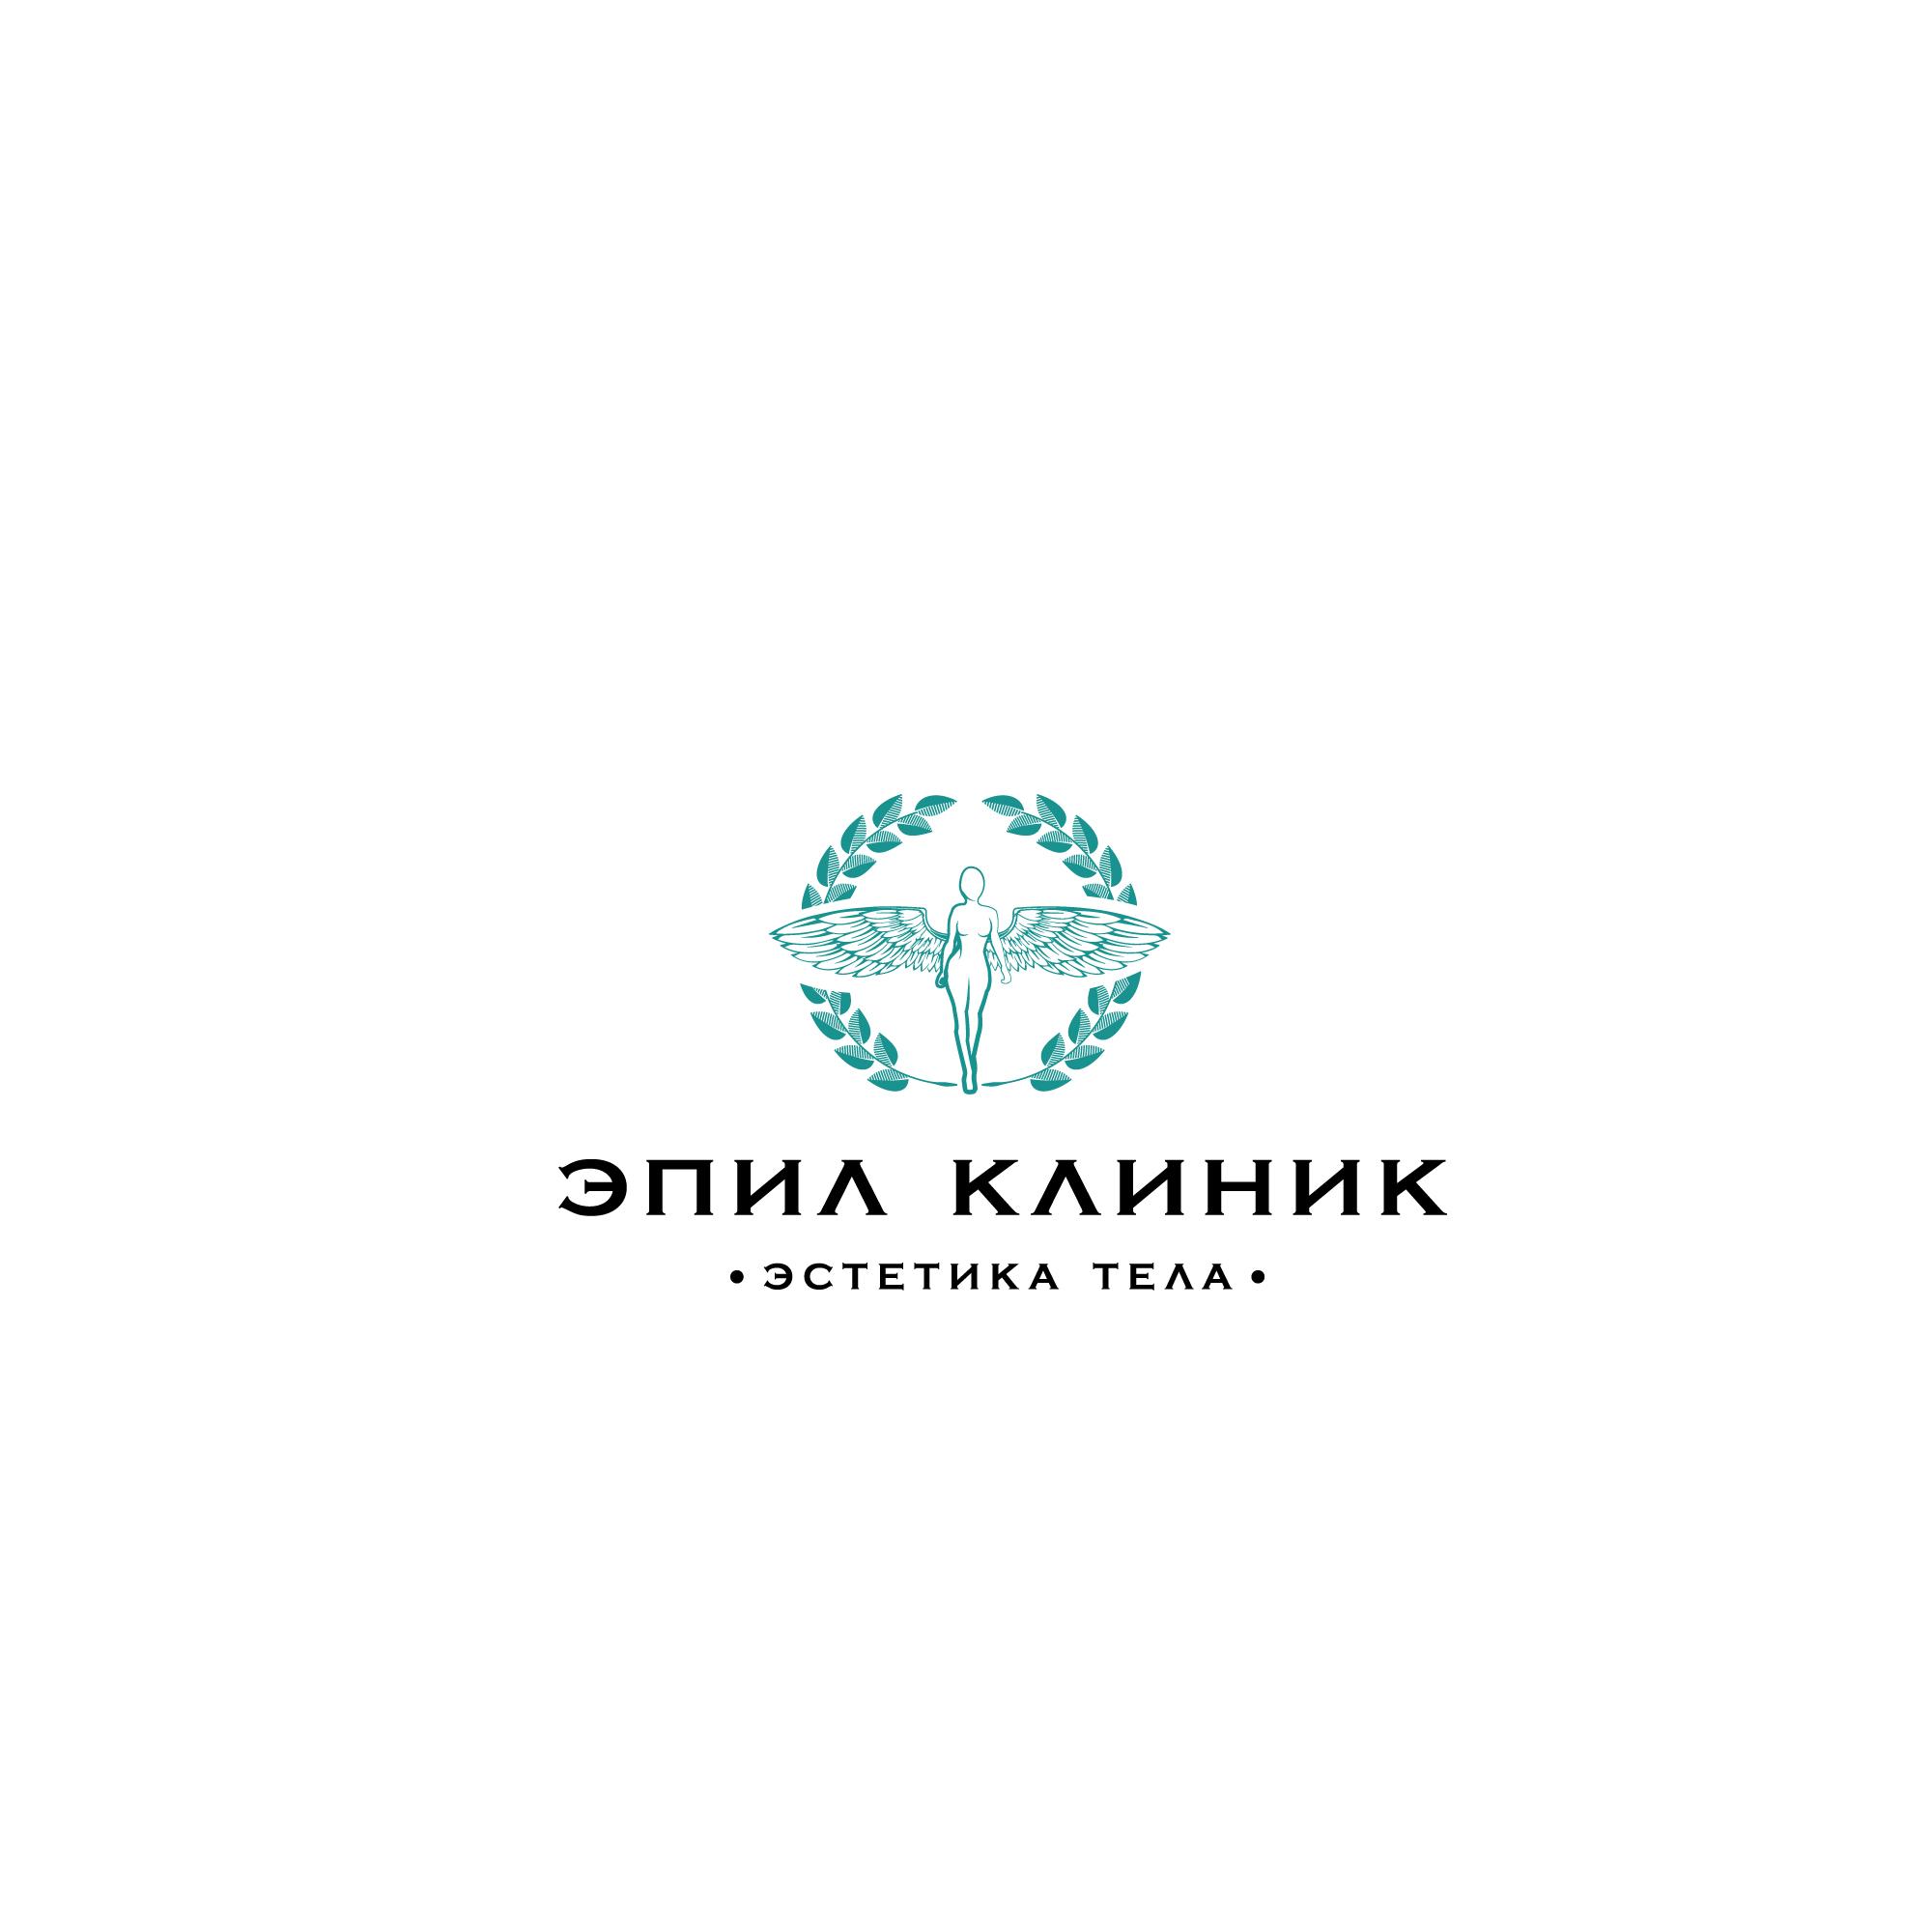 Логотип , фирменный стиль  фото f_5265e18155bc9dac.jpg